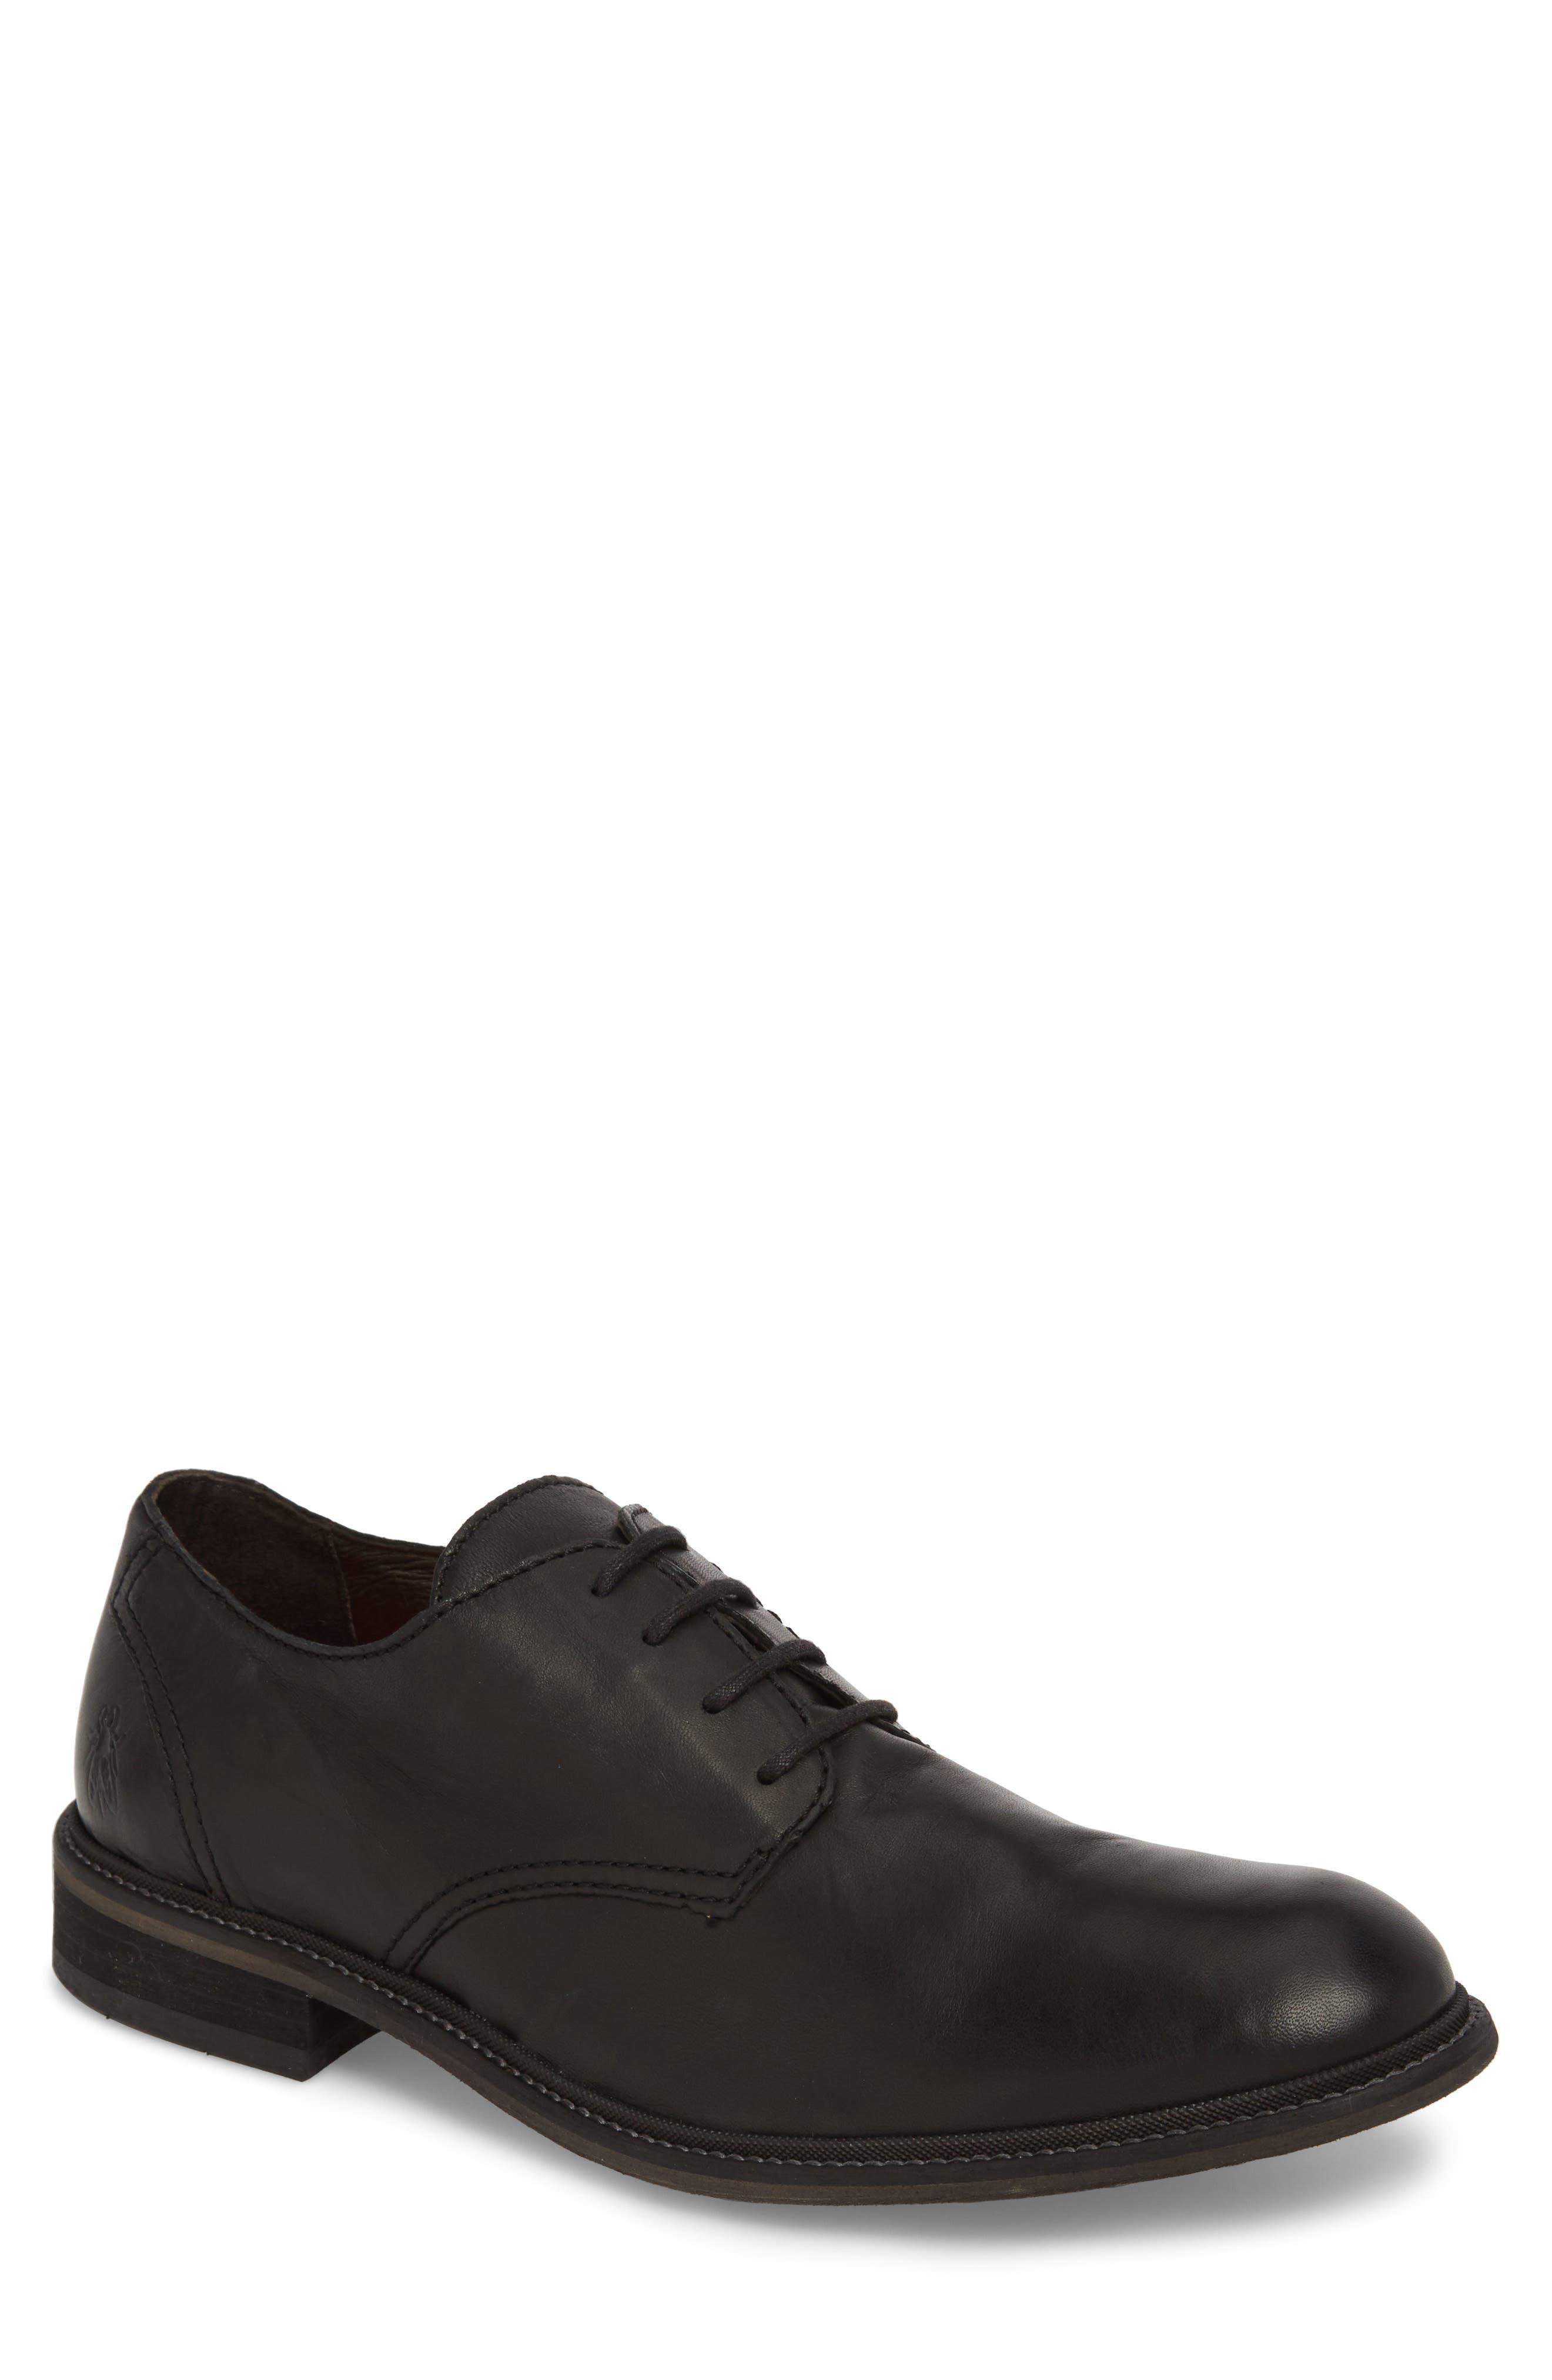 Hoco Plain Toe Derby,                             Main thumbnail 1, color,                             Black Leather